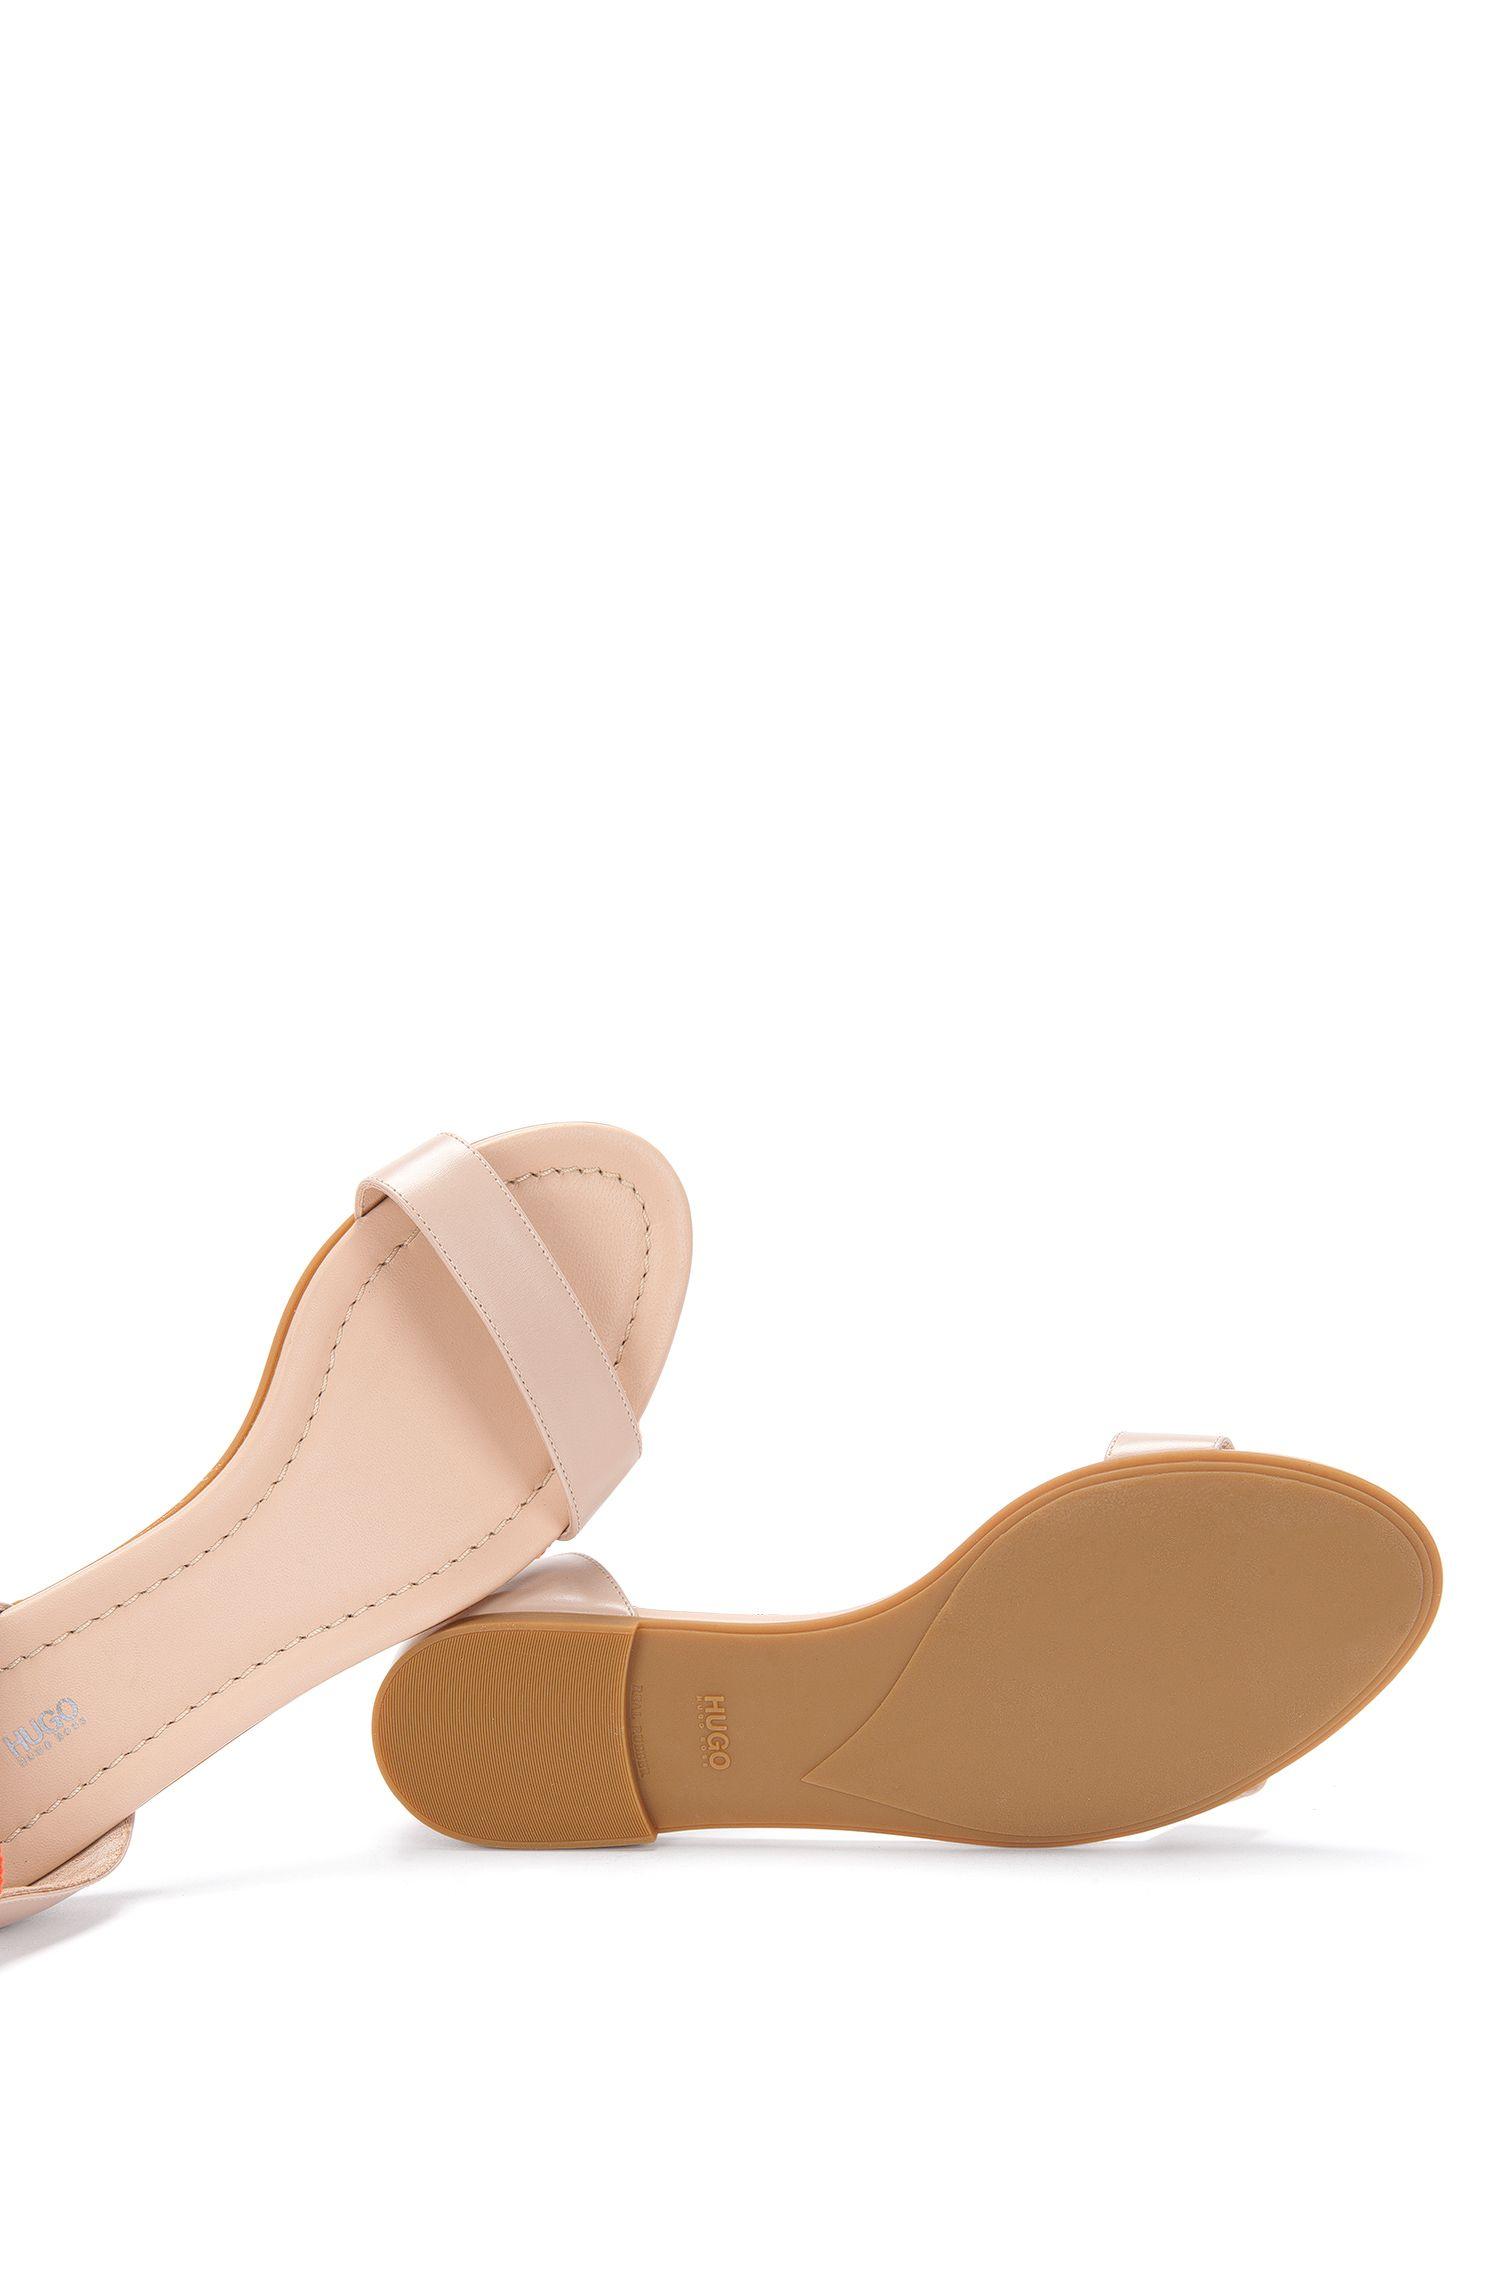 Sandalen aus Leder mit Textil-Bändern: 'Felix'